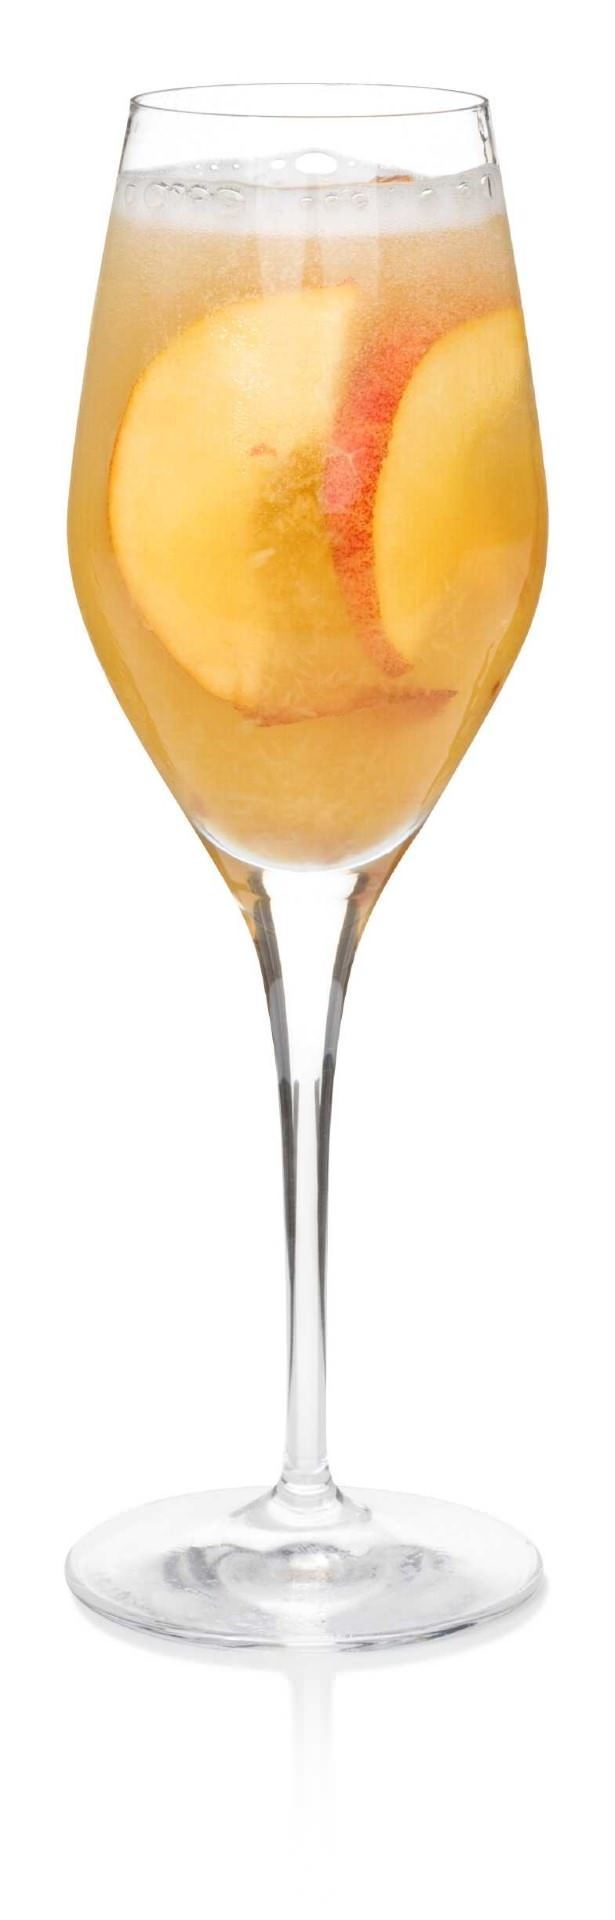 Sparkling Peach Vodka Cocktail | Recipe | Peach vodka